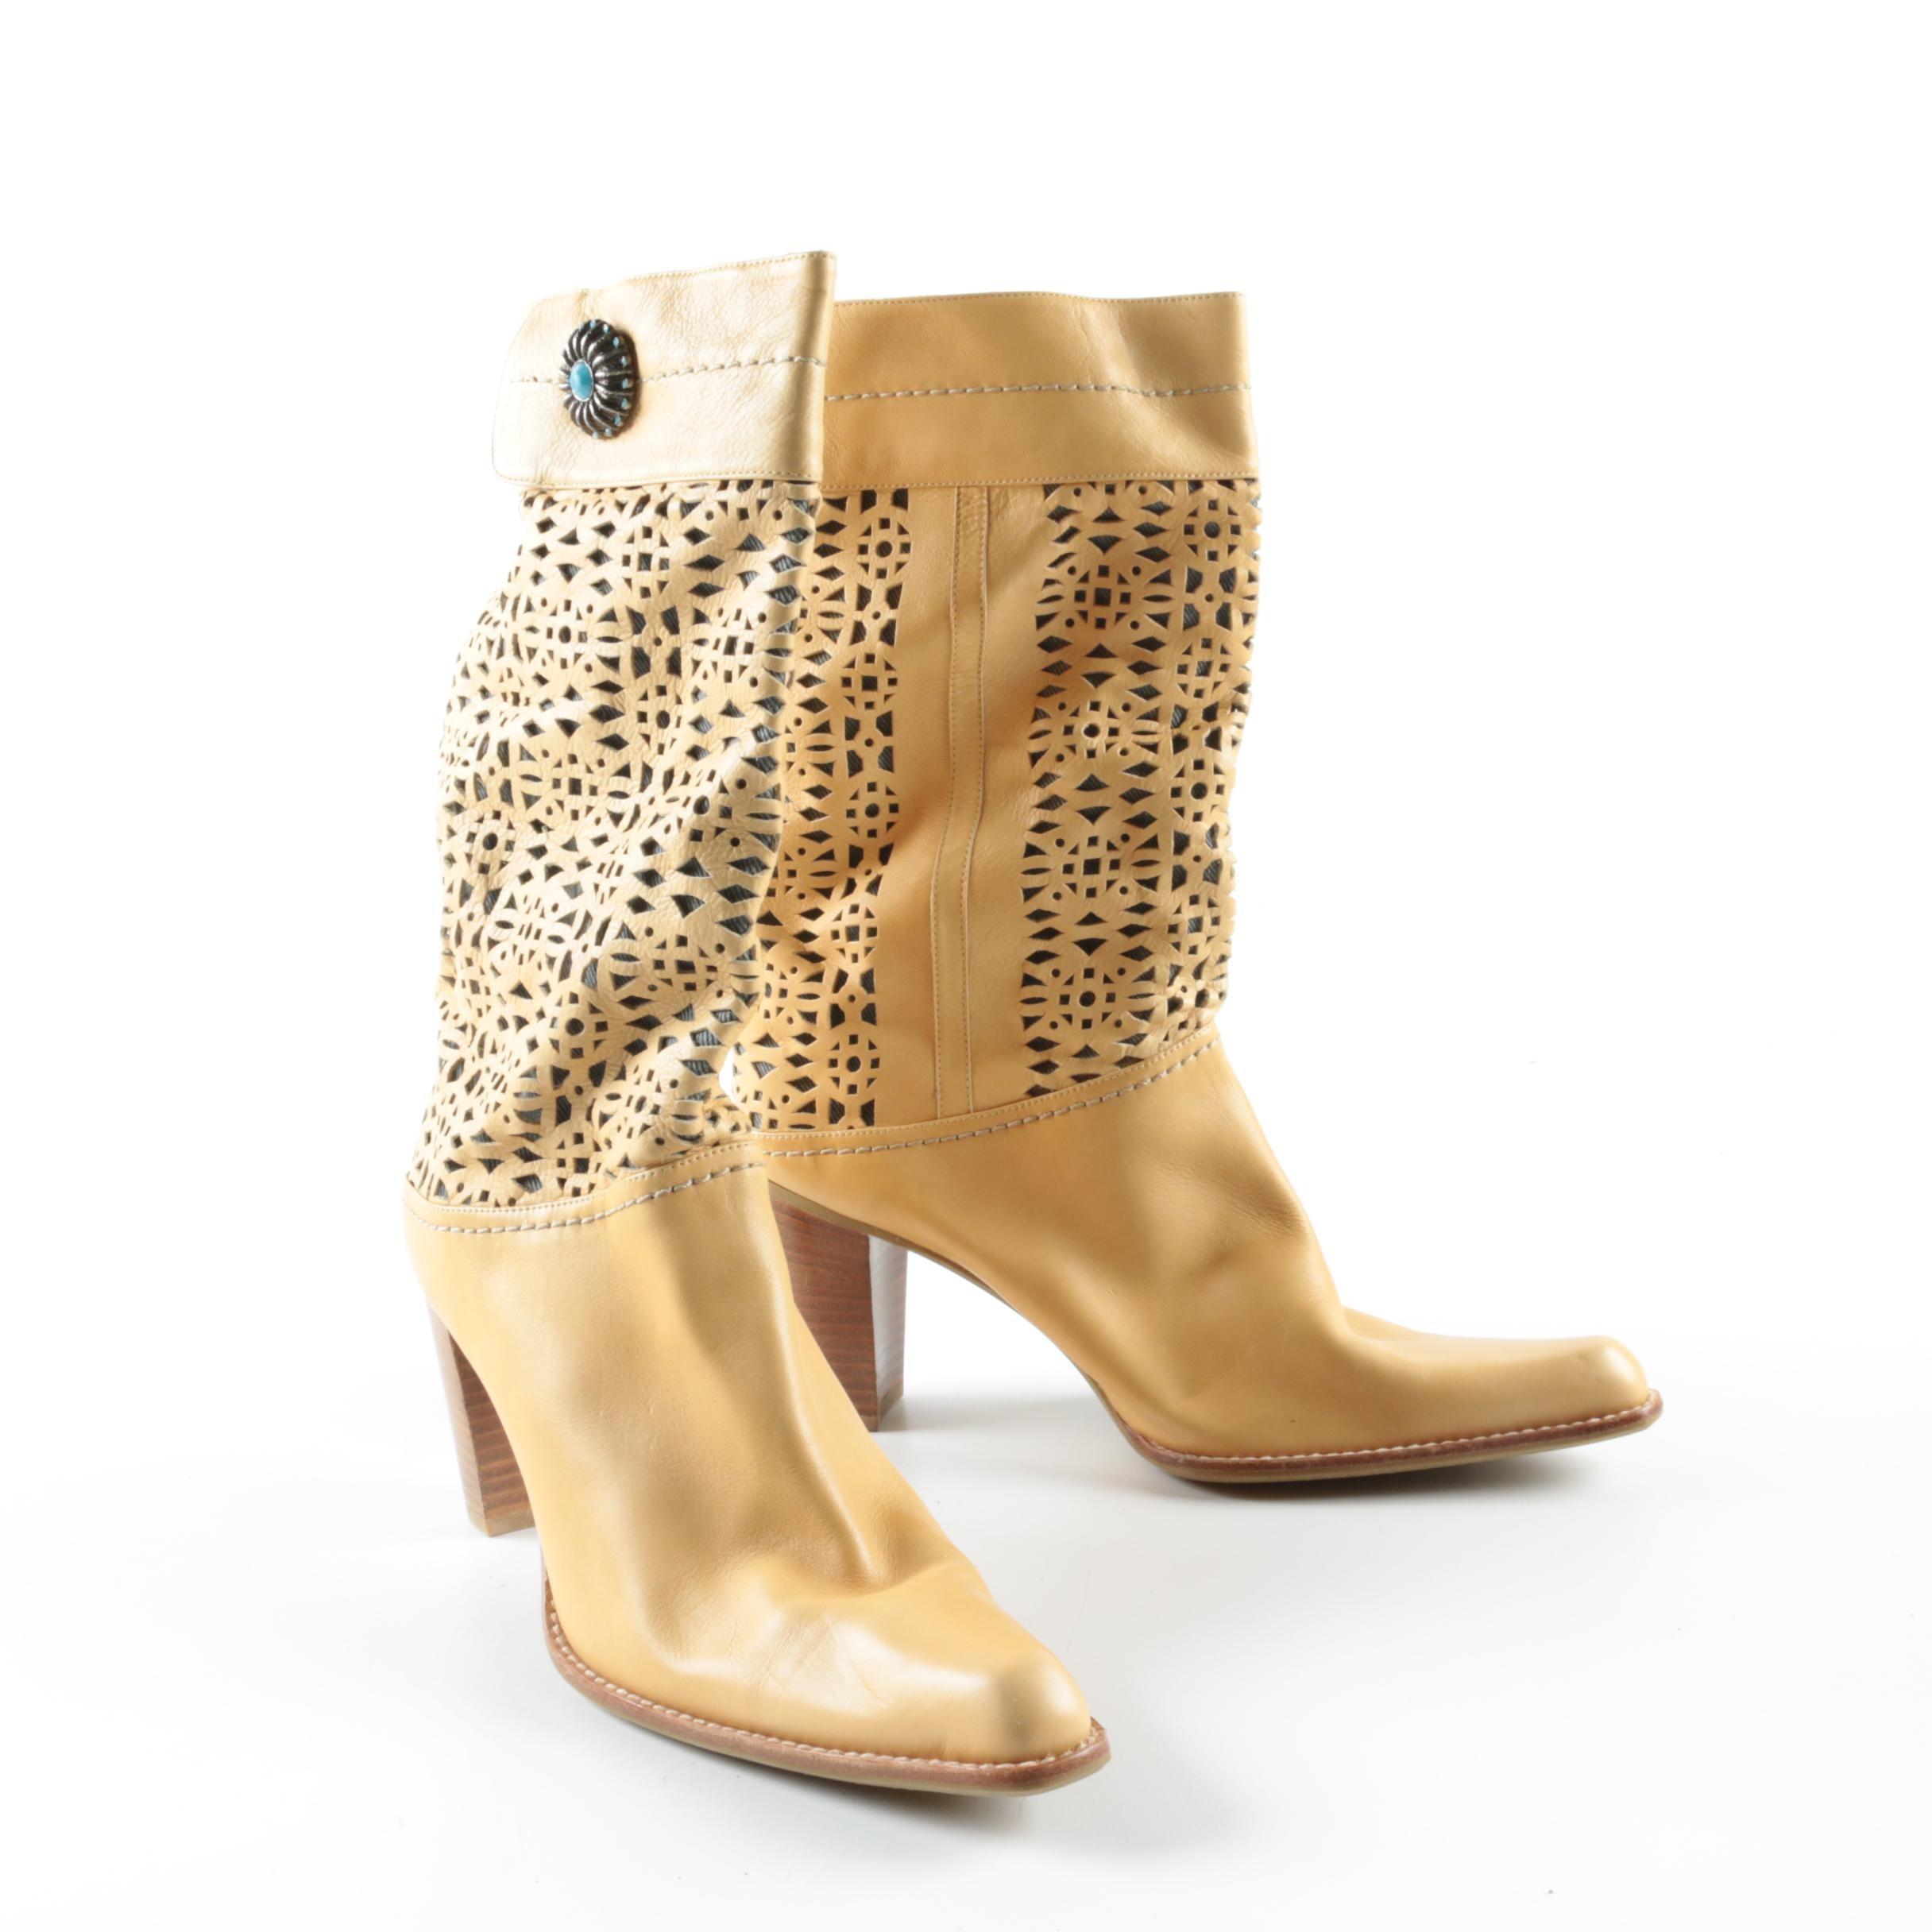 Women's Stuart Weitzman Laser Cut Boots